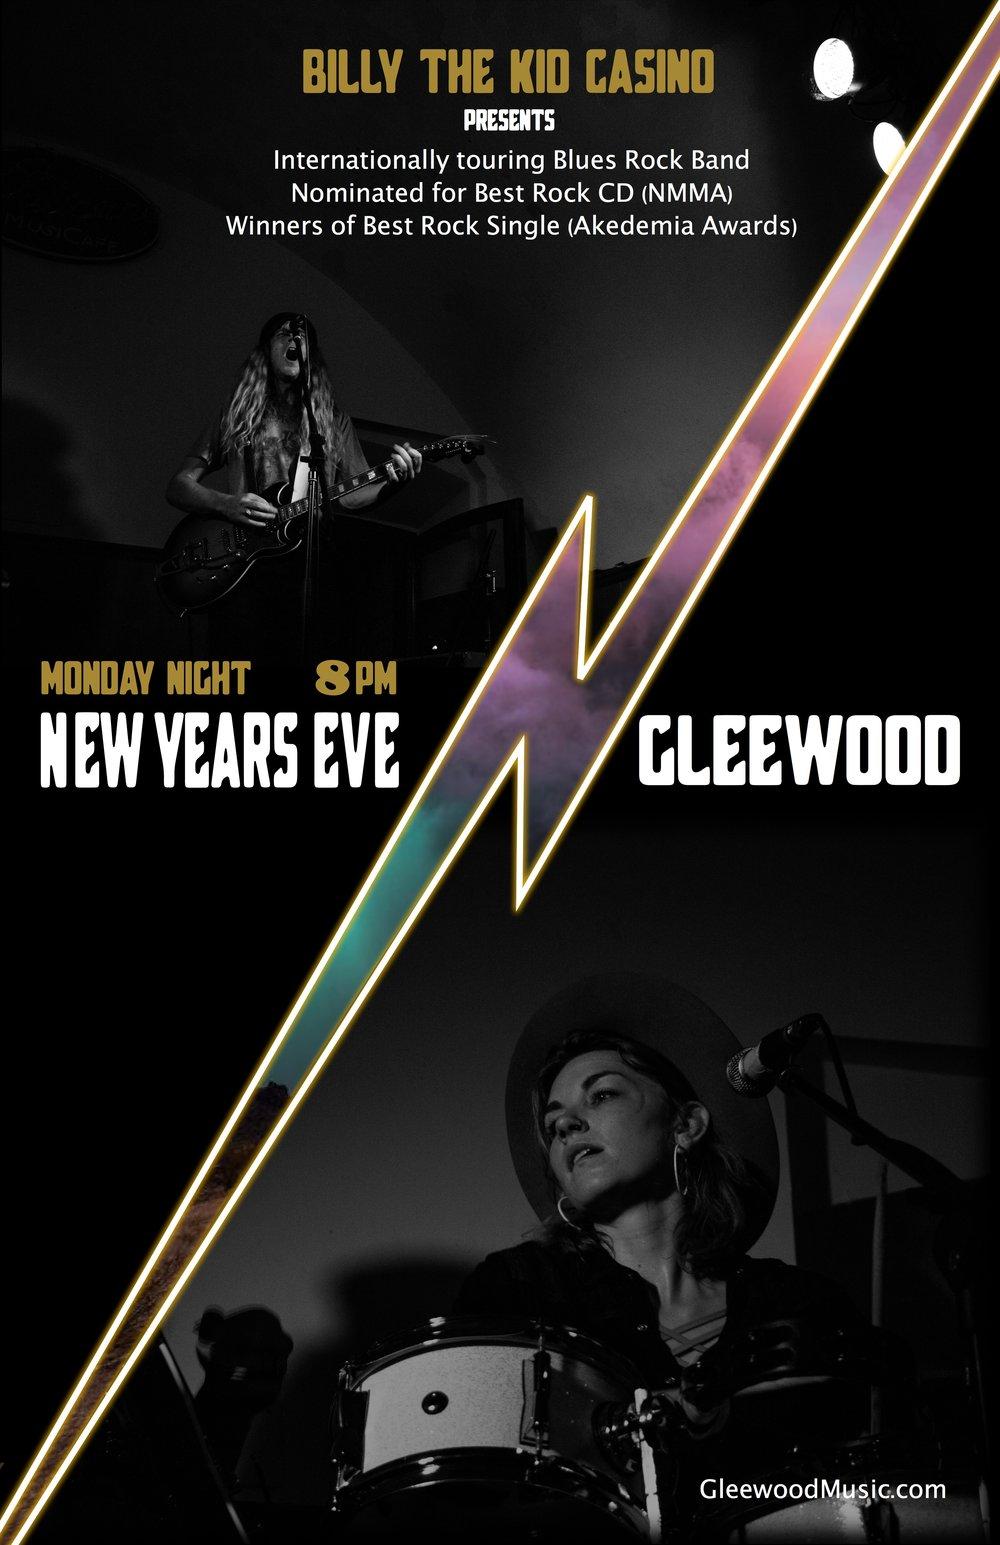 newyearseve-Gleewood.jpg